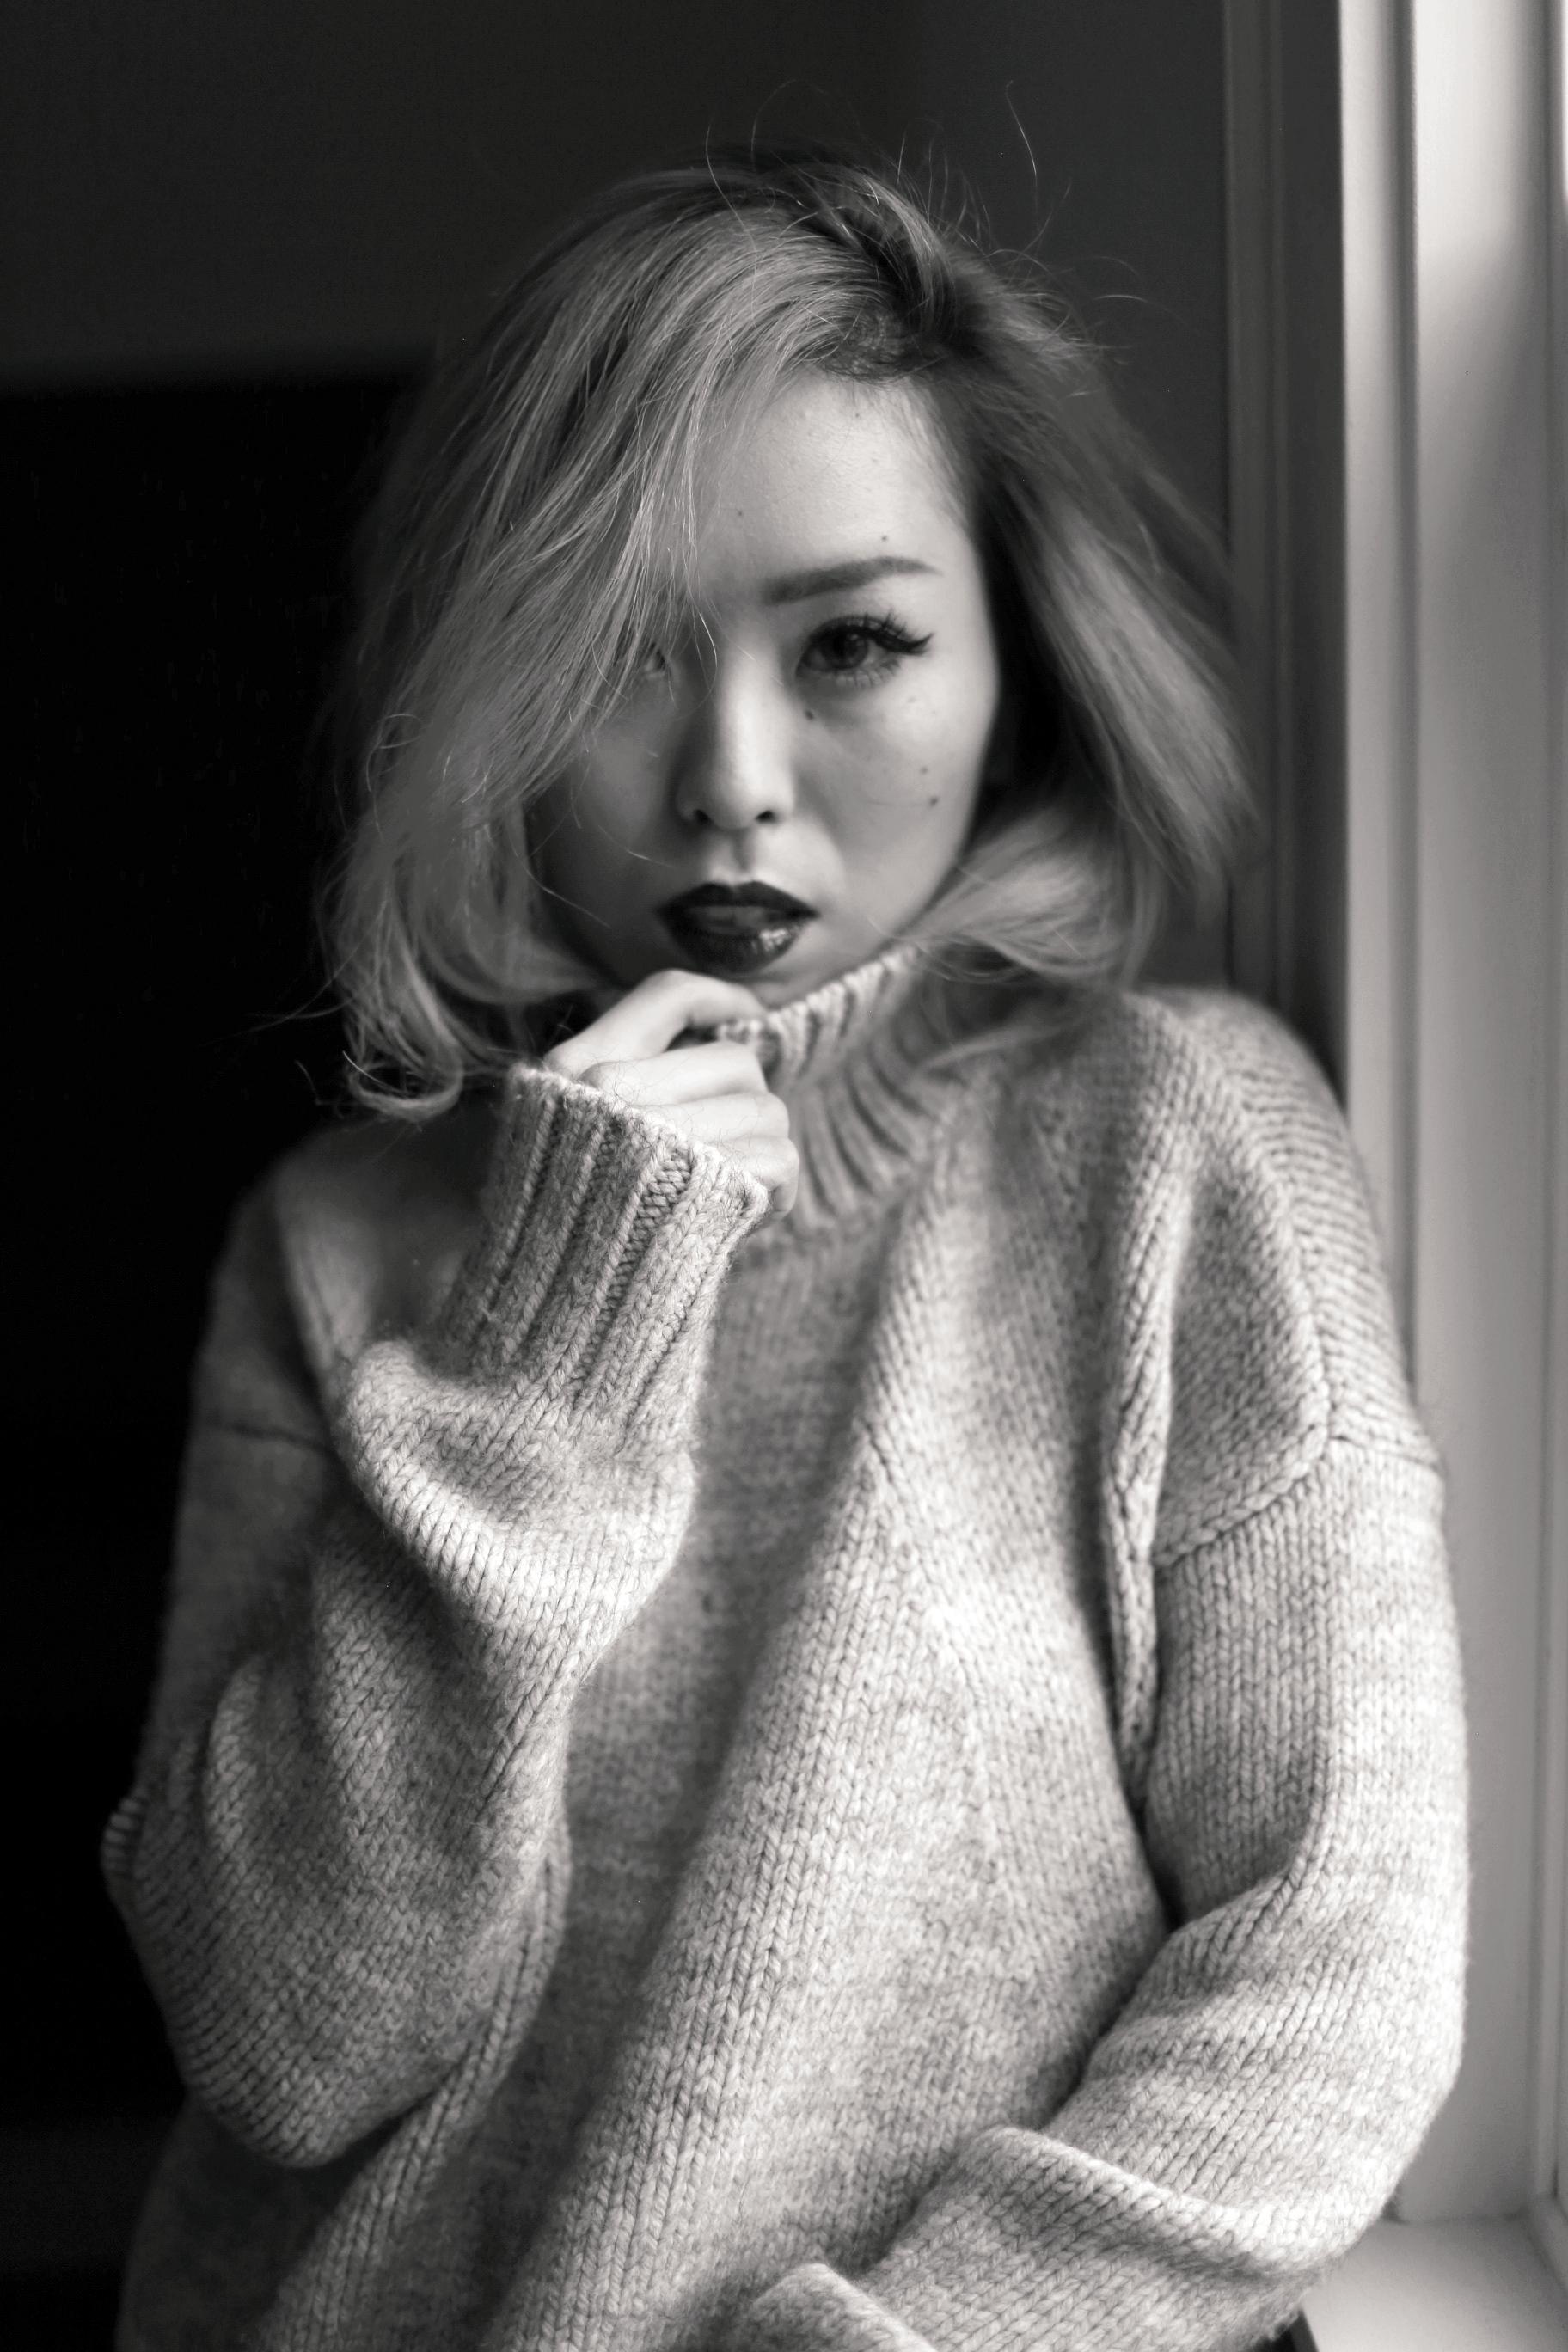 Boudoir Photo-black and white photography-sweater weather-turtle neck sweater-black lingerie-dark lipstick-japanese-Aika's Love Closet-Seattle model-Seattle Style blogger 5